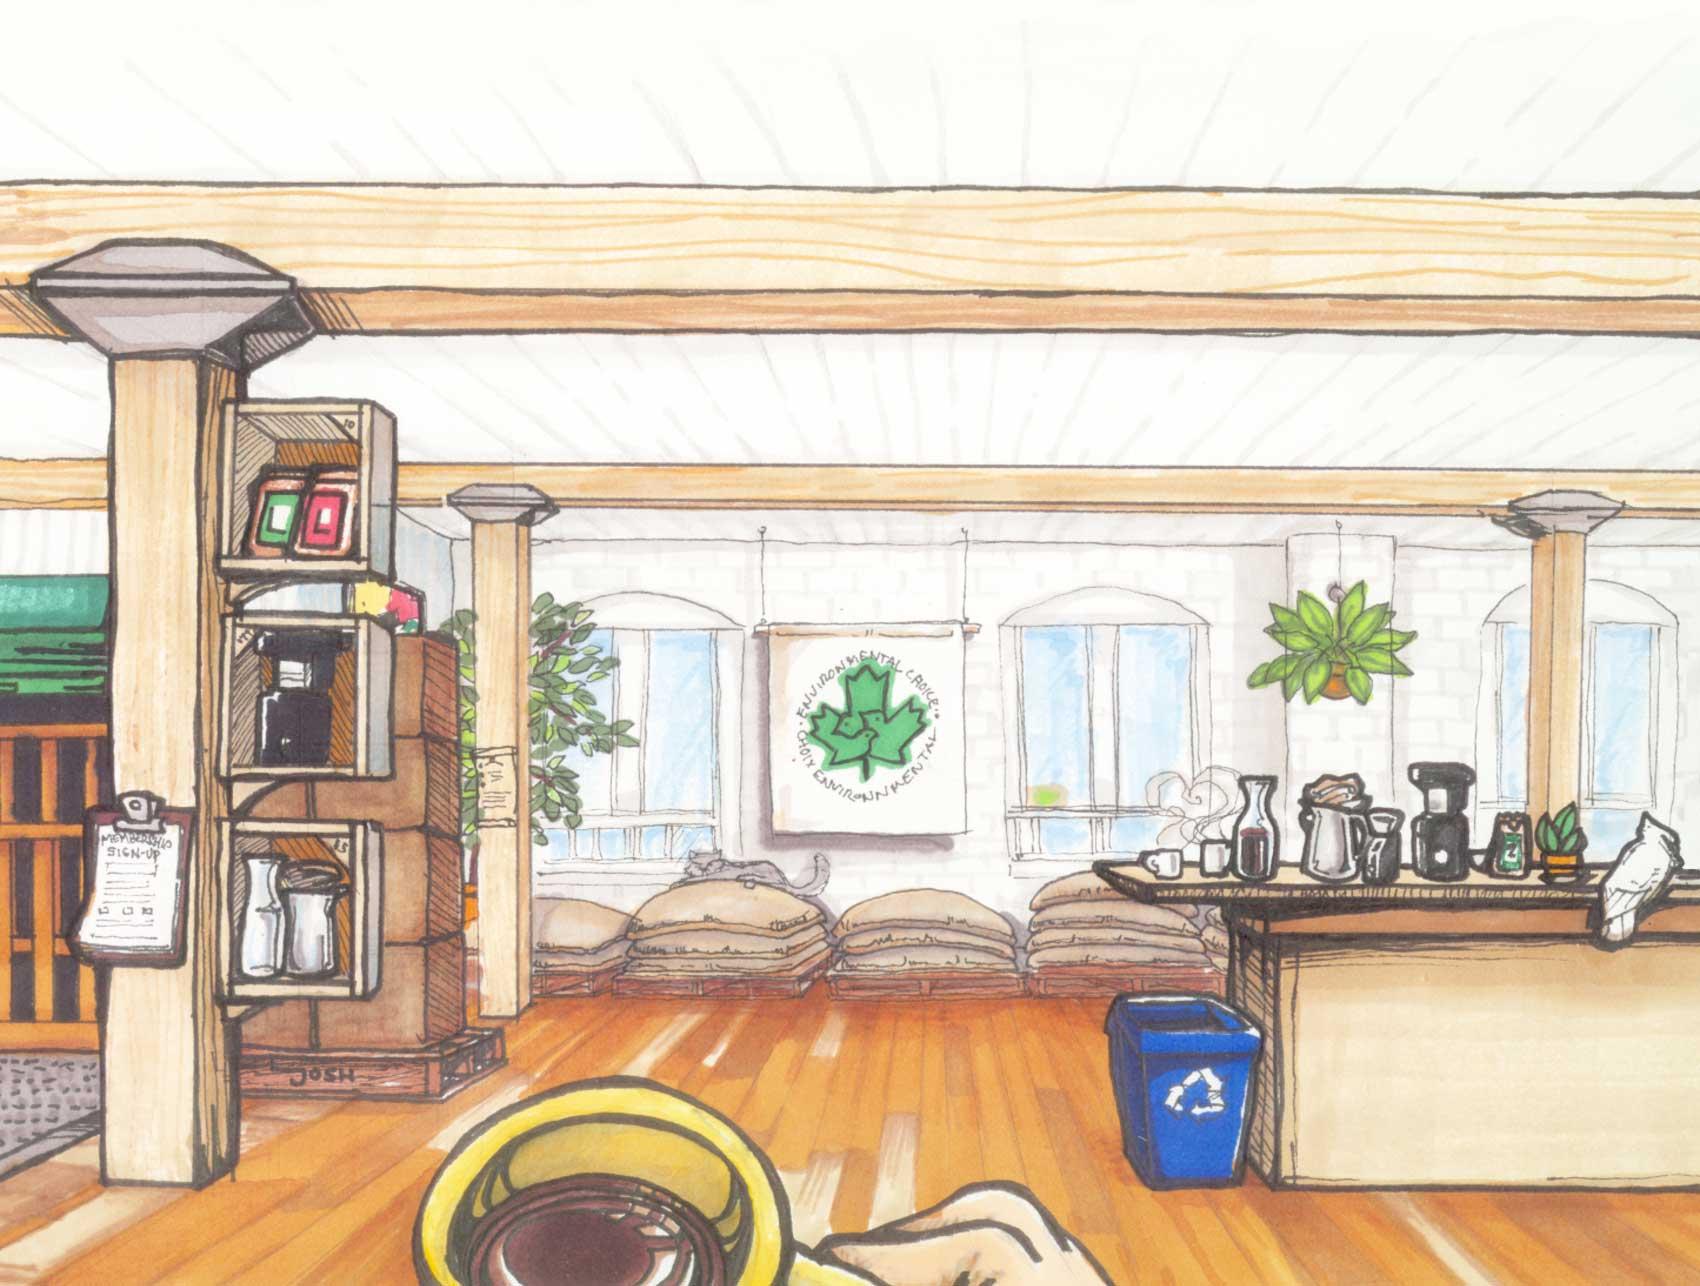 Merchants of Green Coffee HQ. Original artwork by Josh Sinclair.